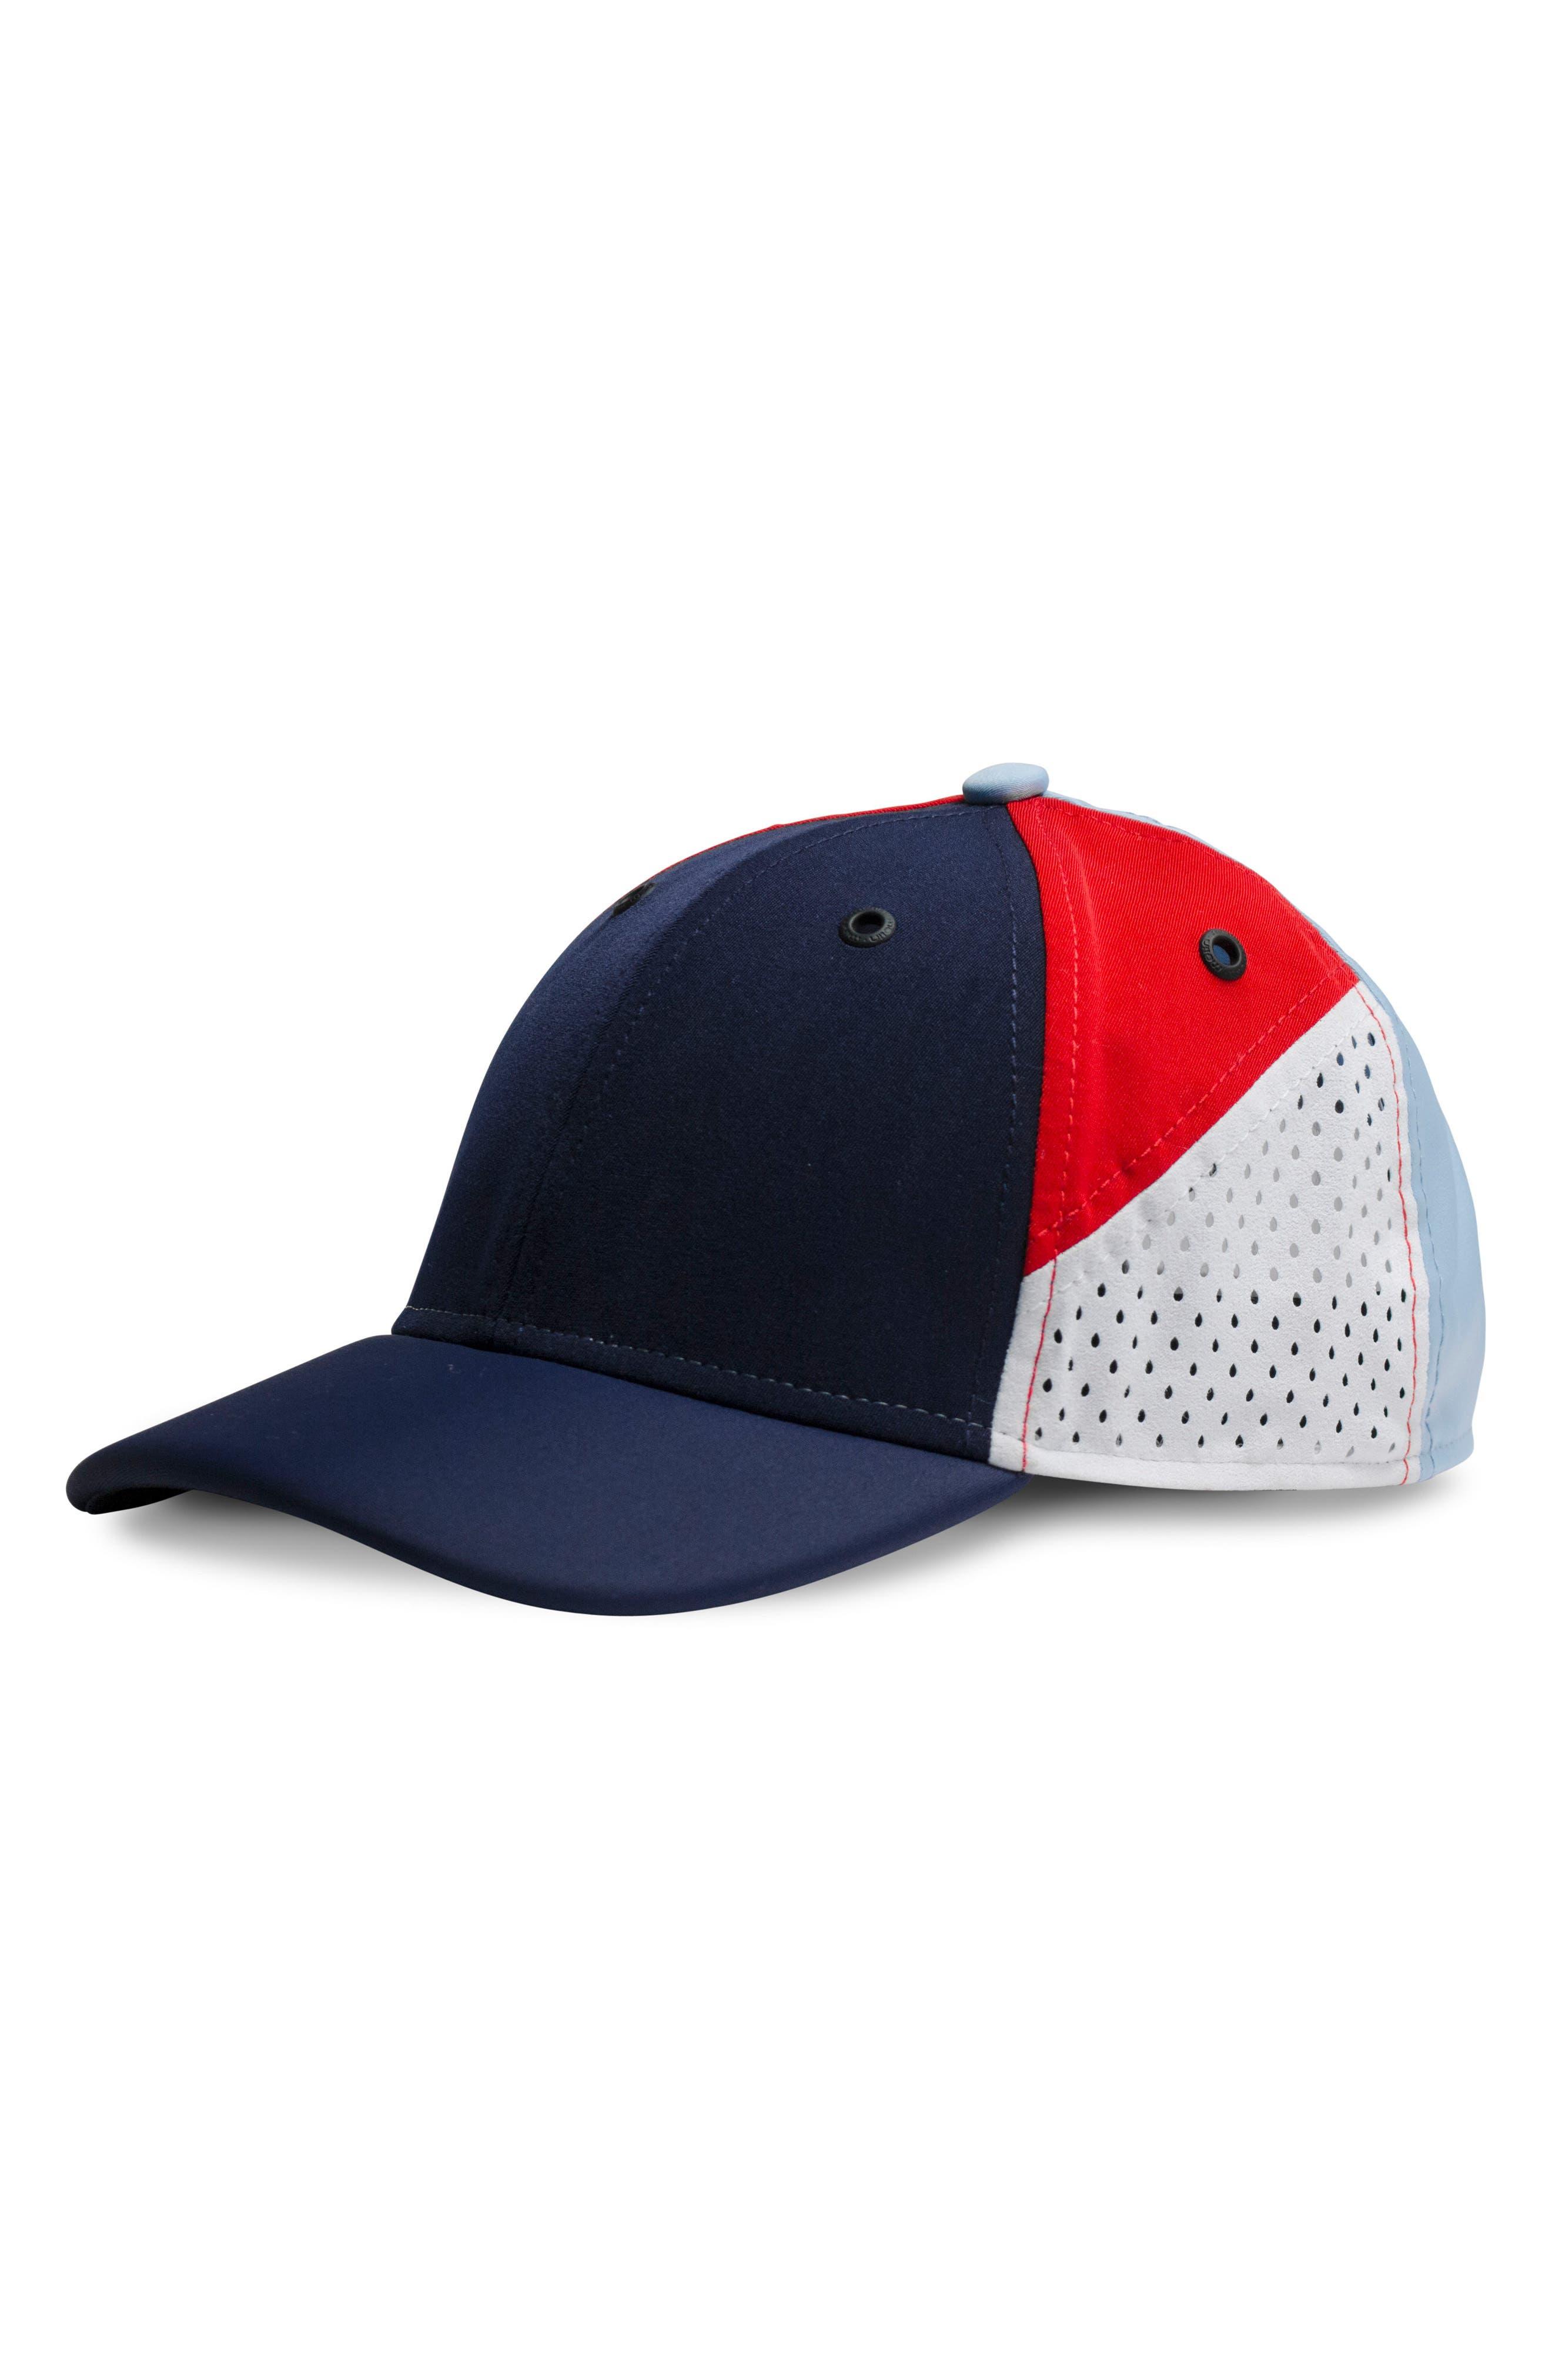 Melin The Assault Snapback Baseball Cap